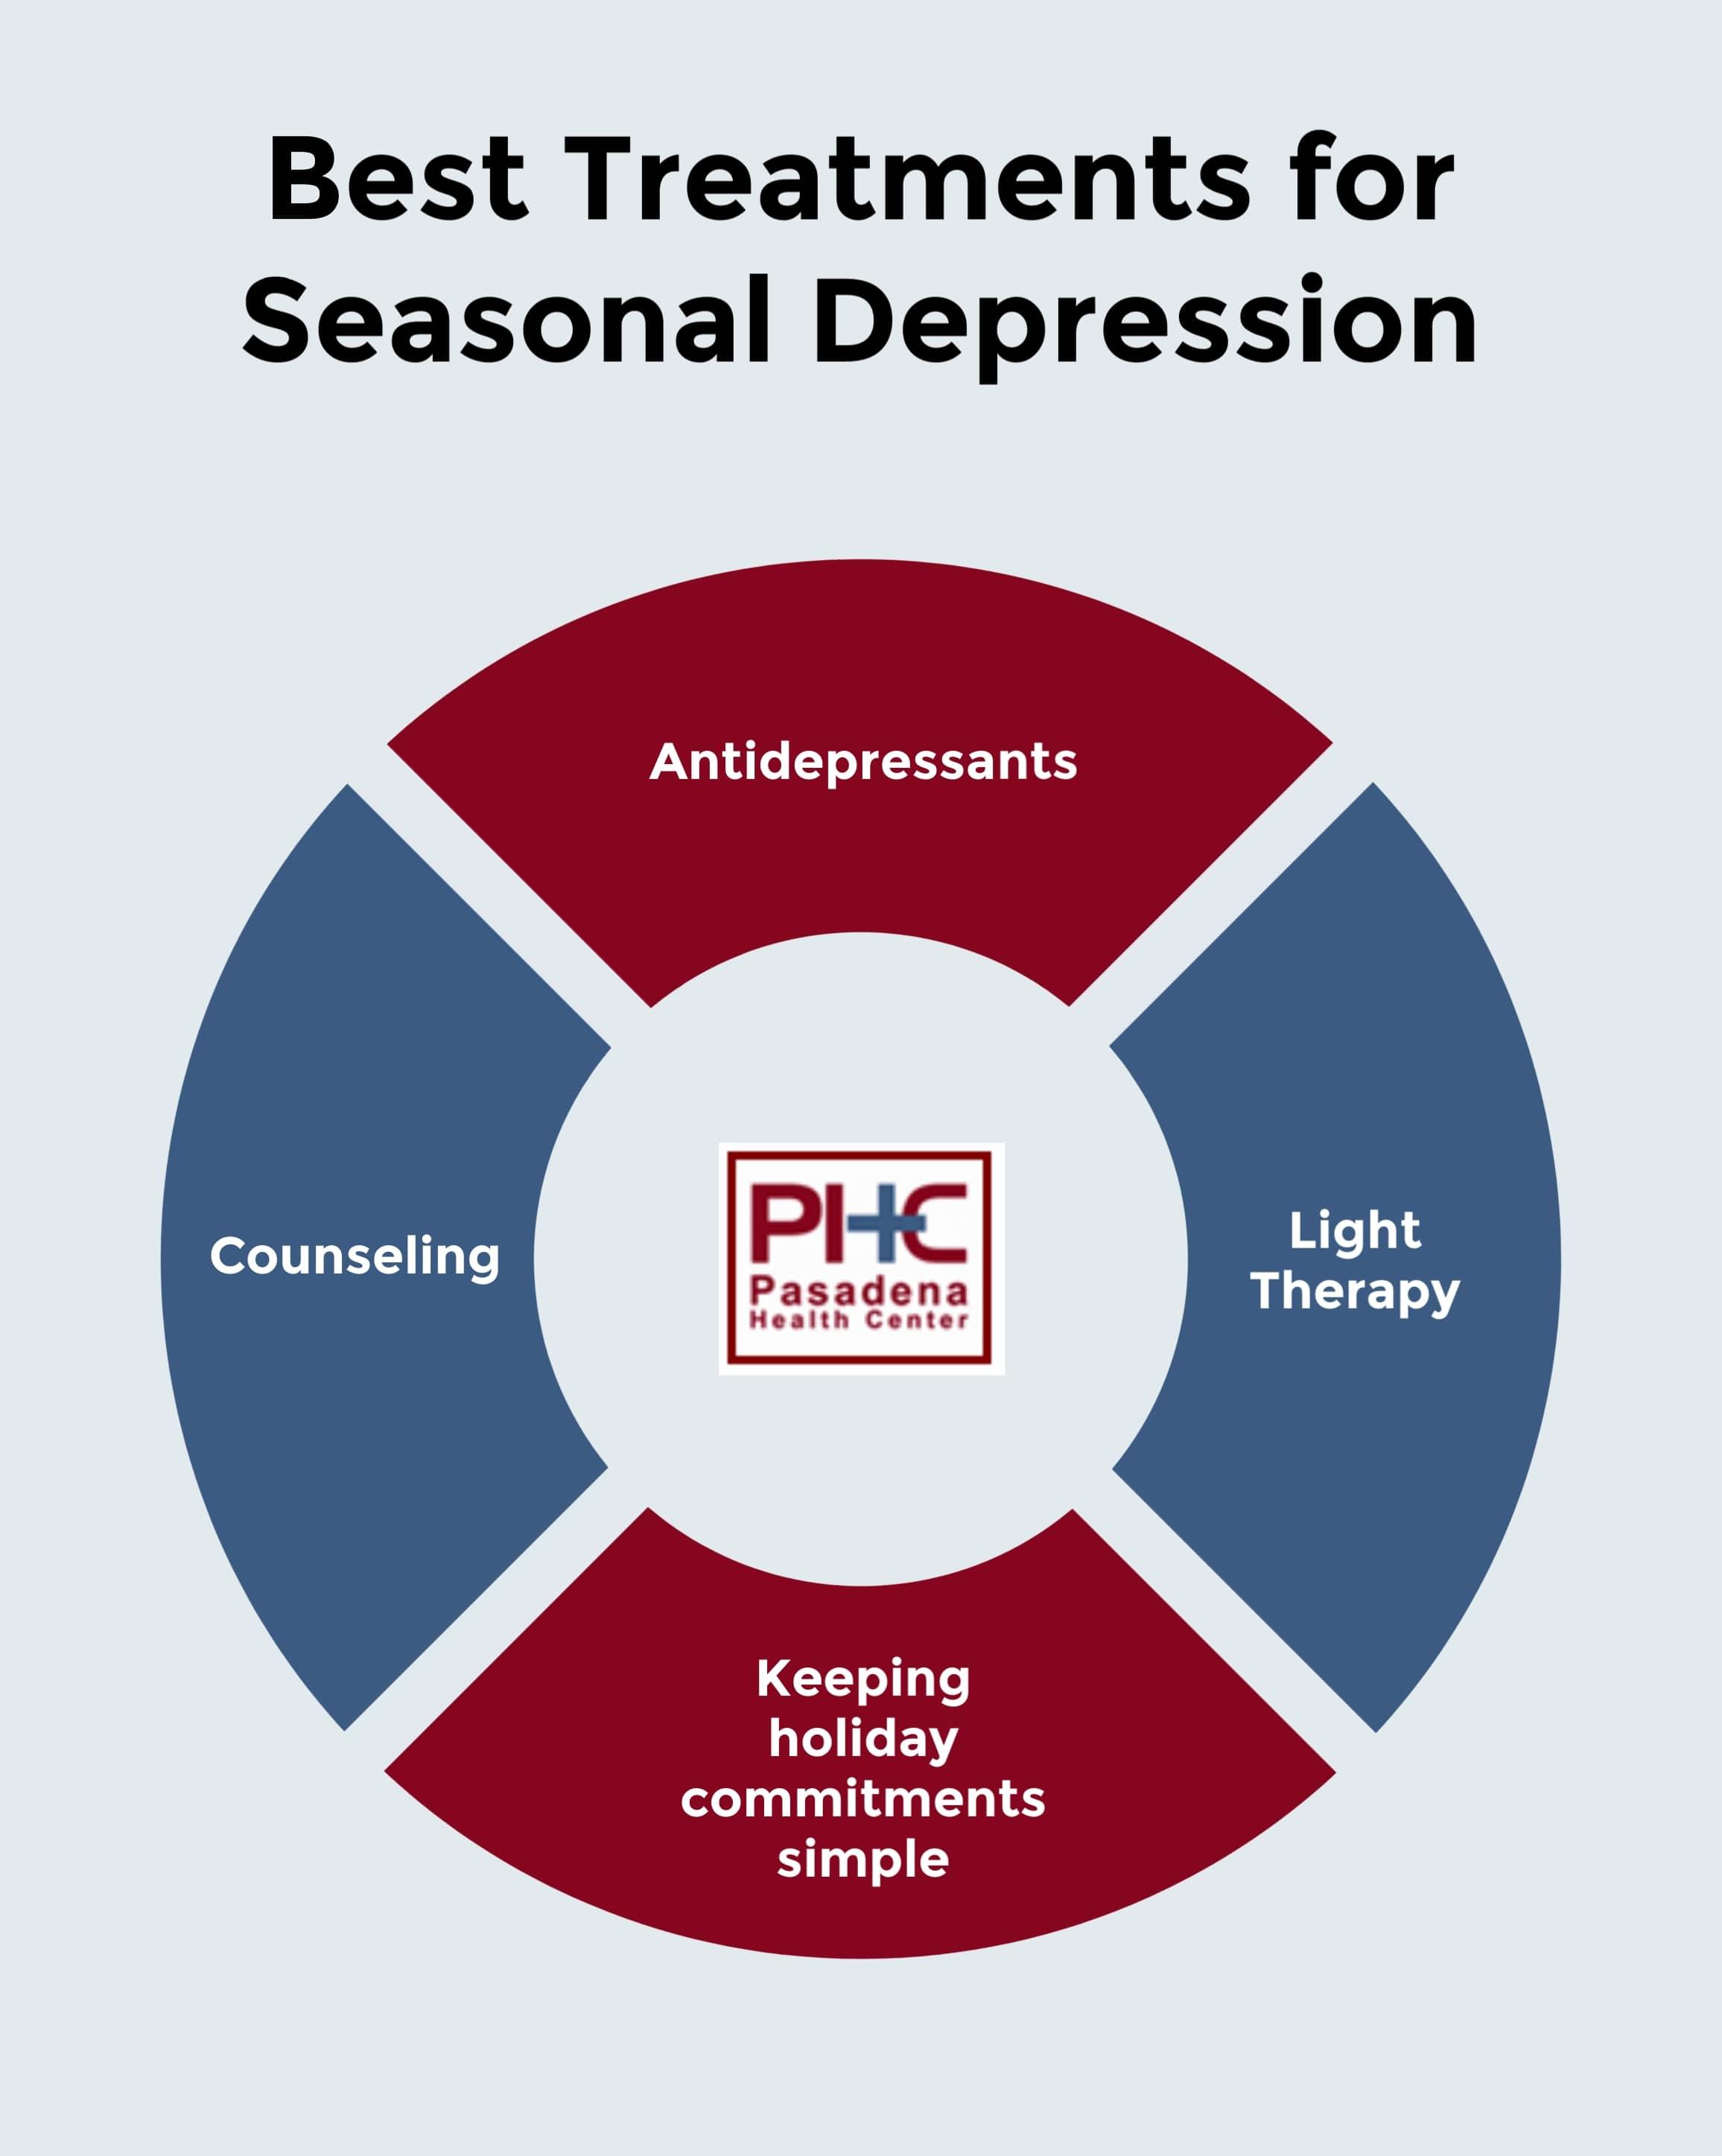 Dealing with Holiday Depression in 2019, Pasadena Health Center, Pasadena, TX